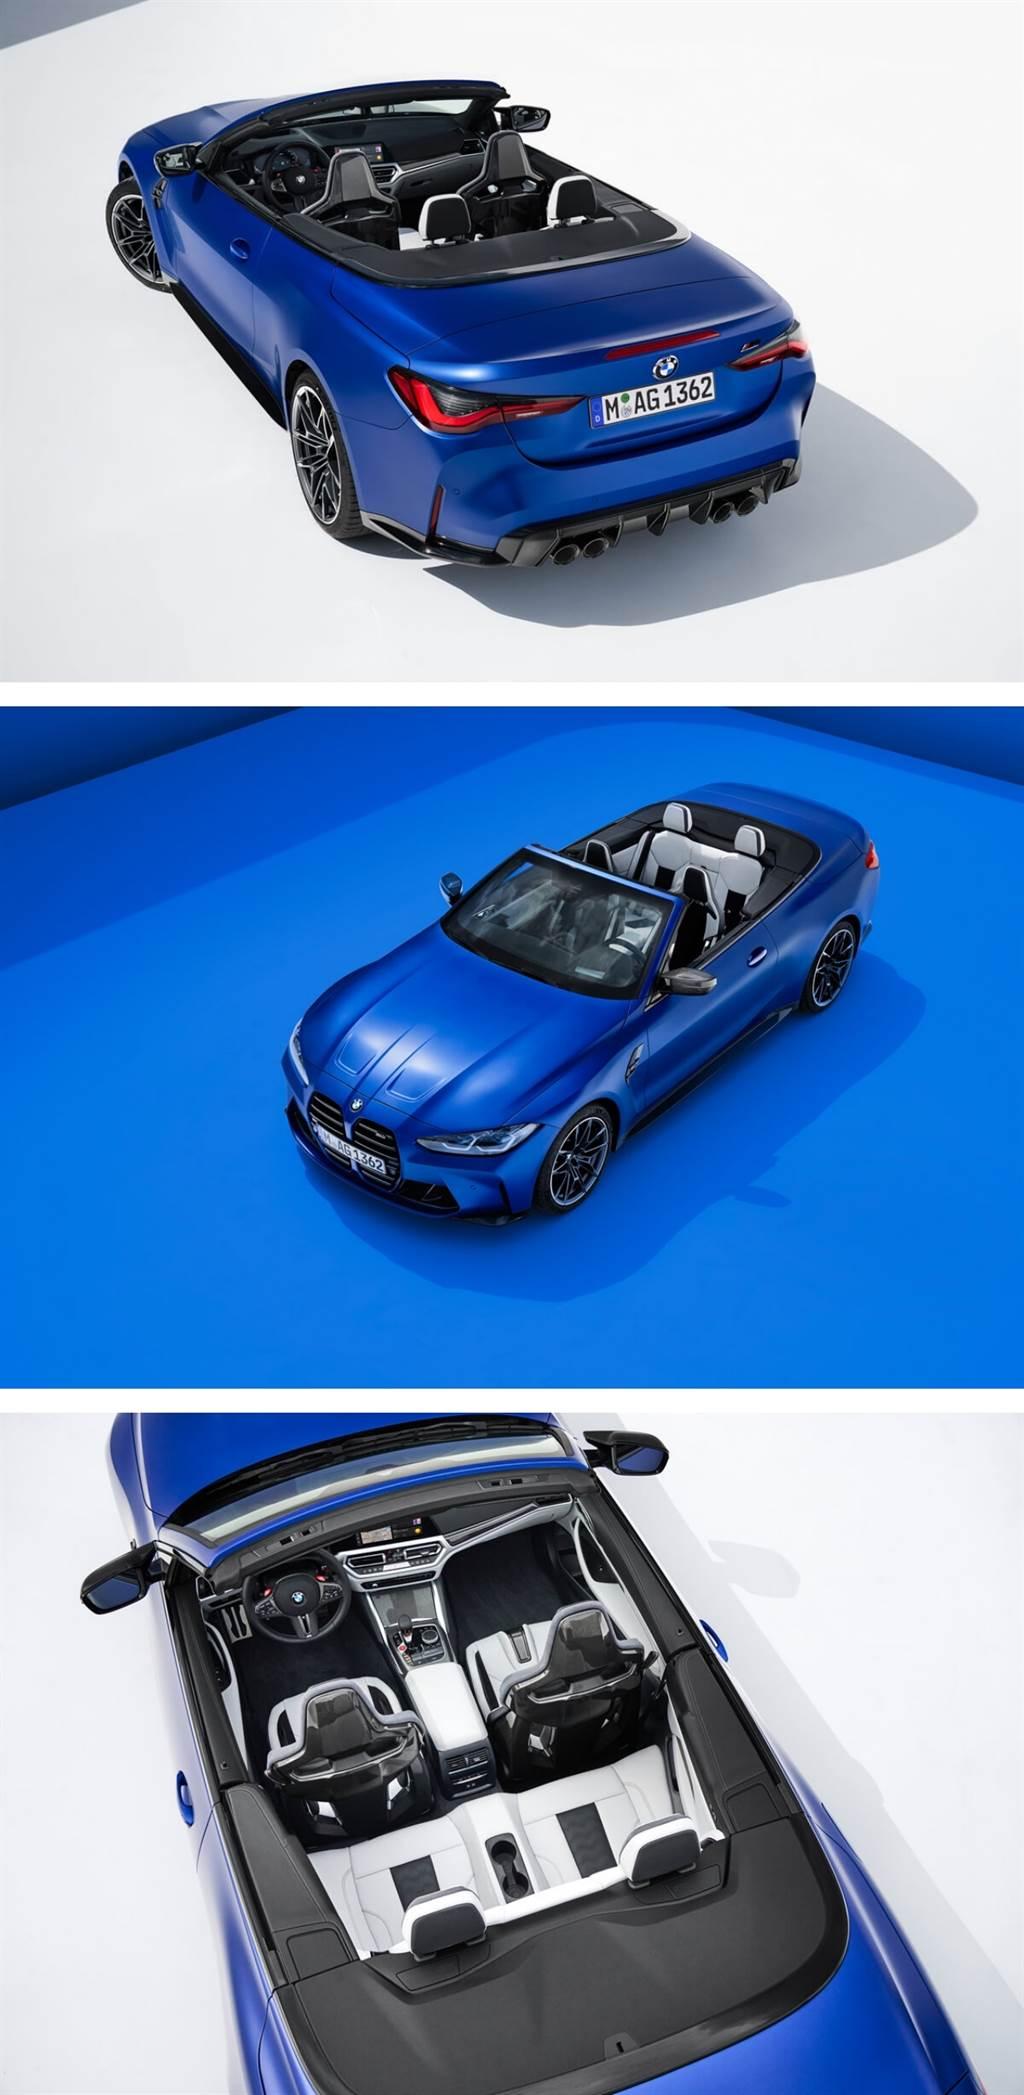 BMW M4 Competition Convertible登場!標準配置M xDrive全輪驅動系統